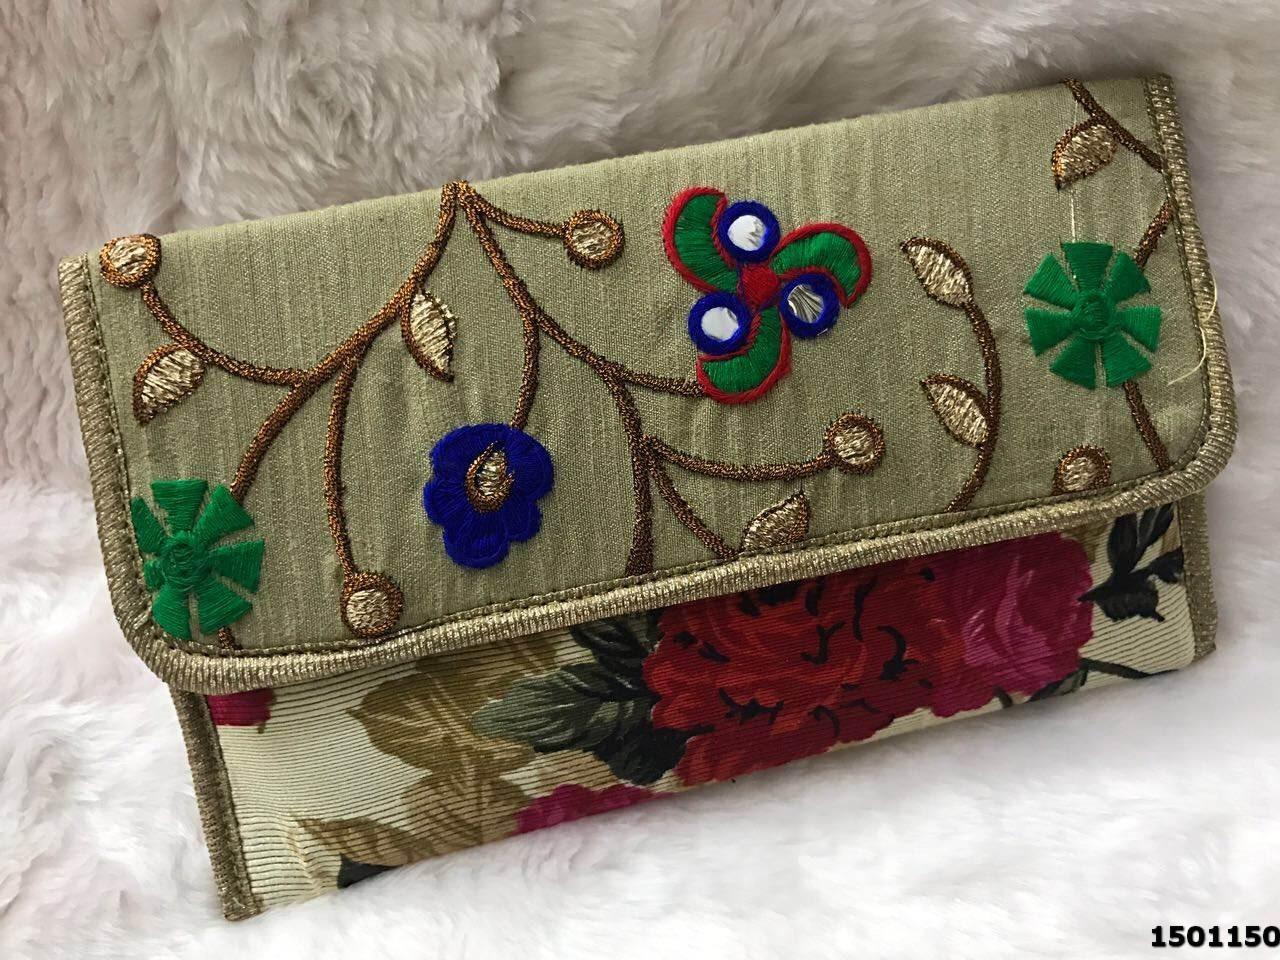 Adorable Ethnic Clutch Bag